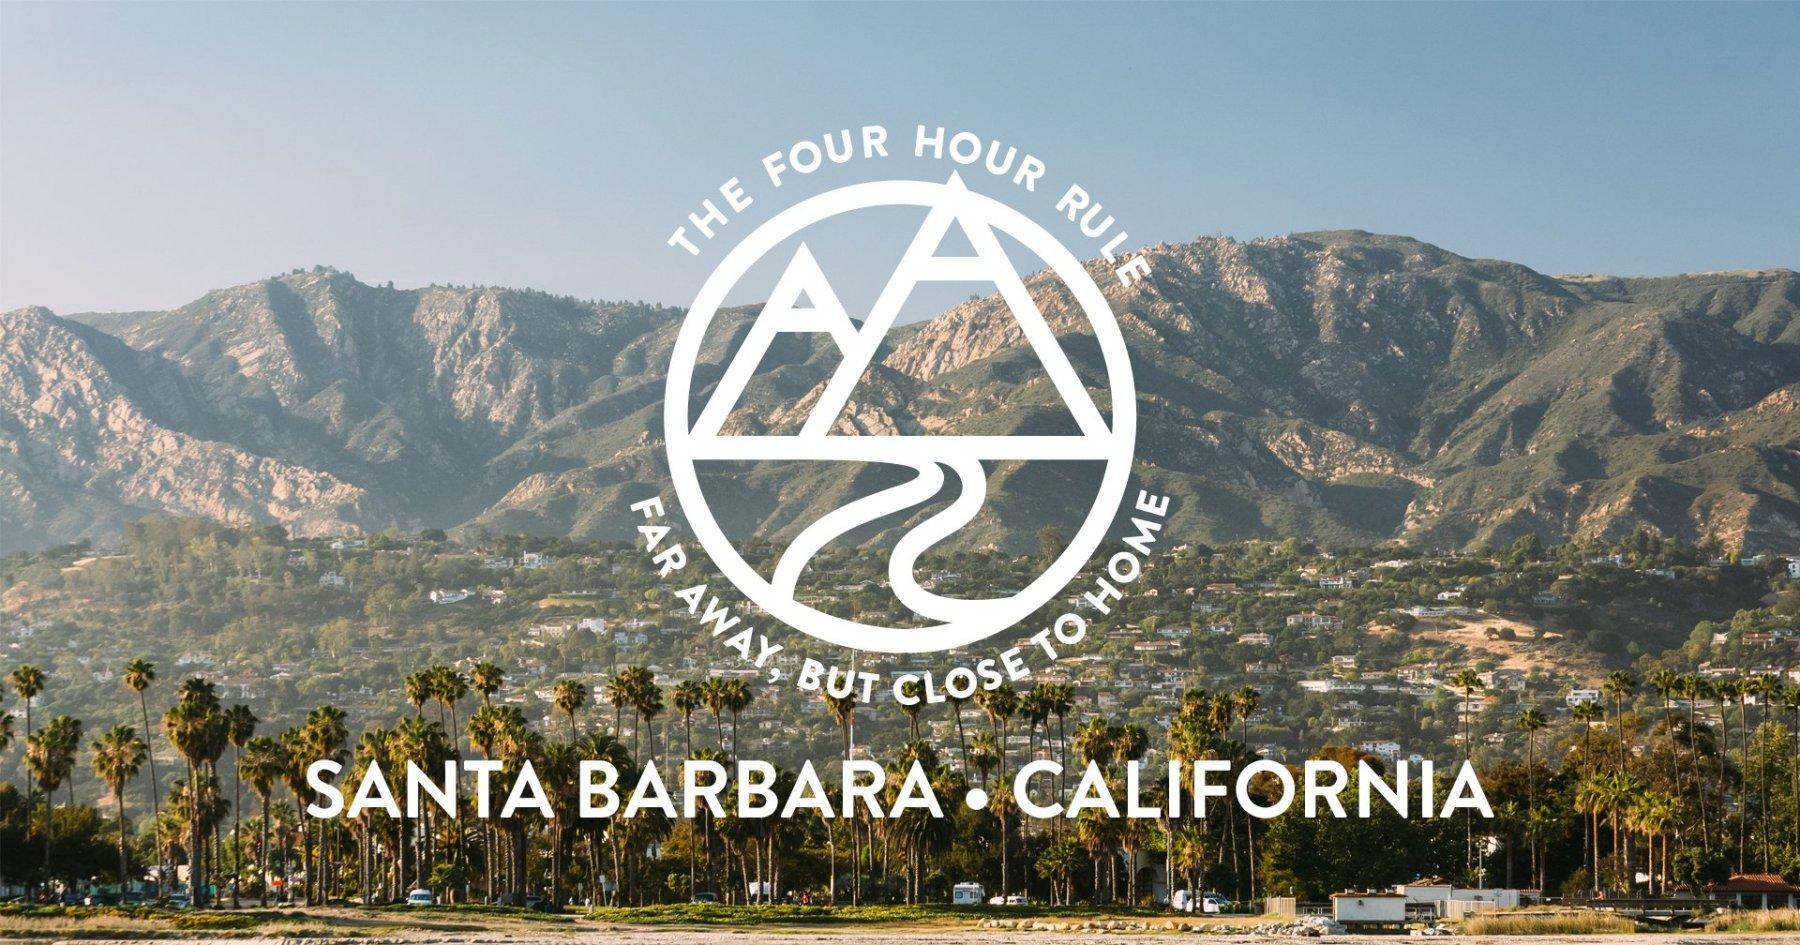 The Four Hour Rule: Santa Barbara